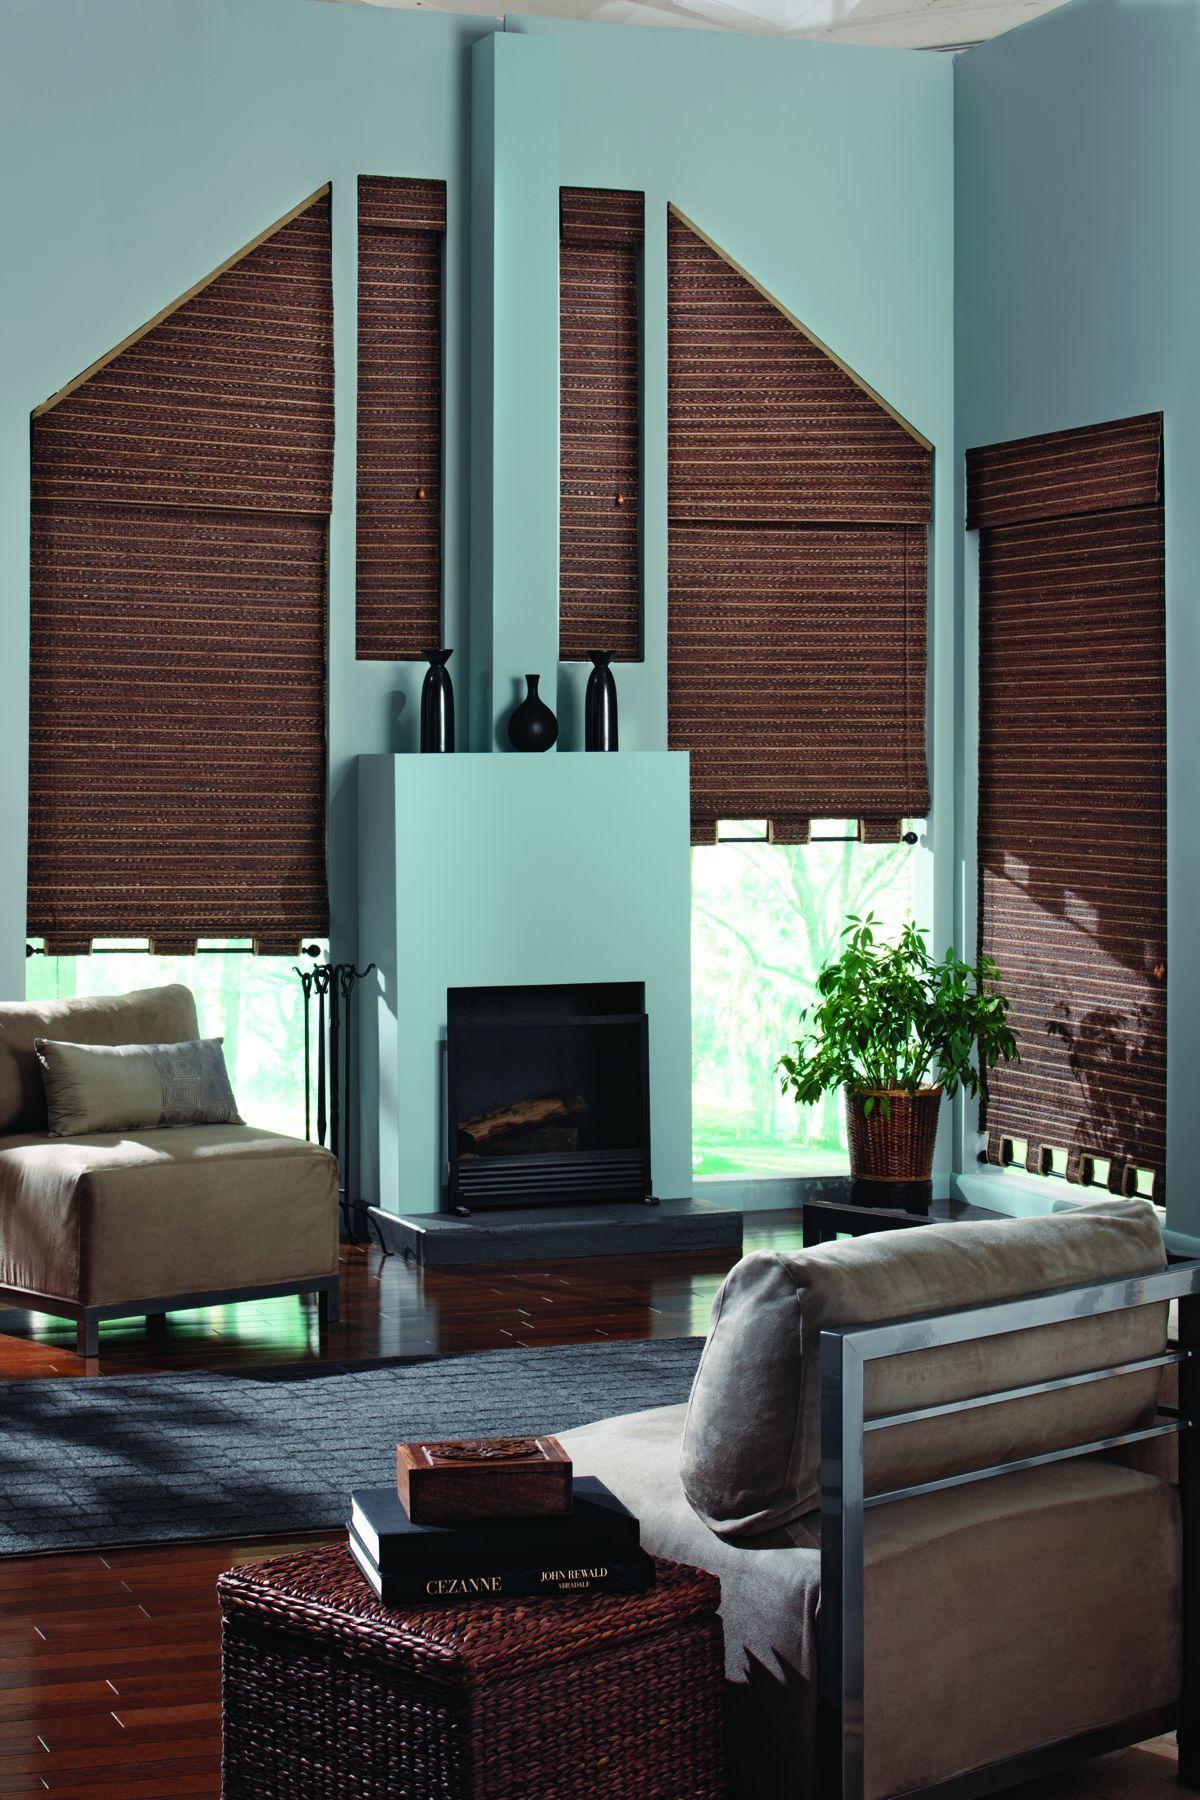 Triangle windows photos supplying wooden window shutters for - Angle Top Angle Bottom And Triangle Window Treatments Woven Wood Shadesshaped Windowswindow